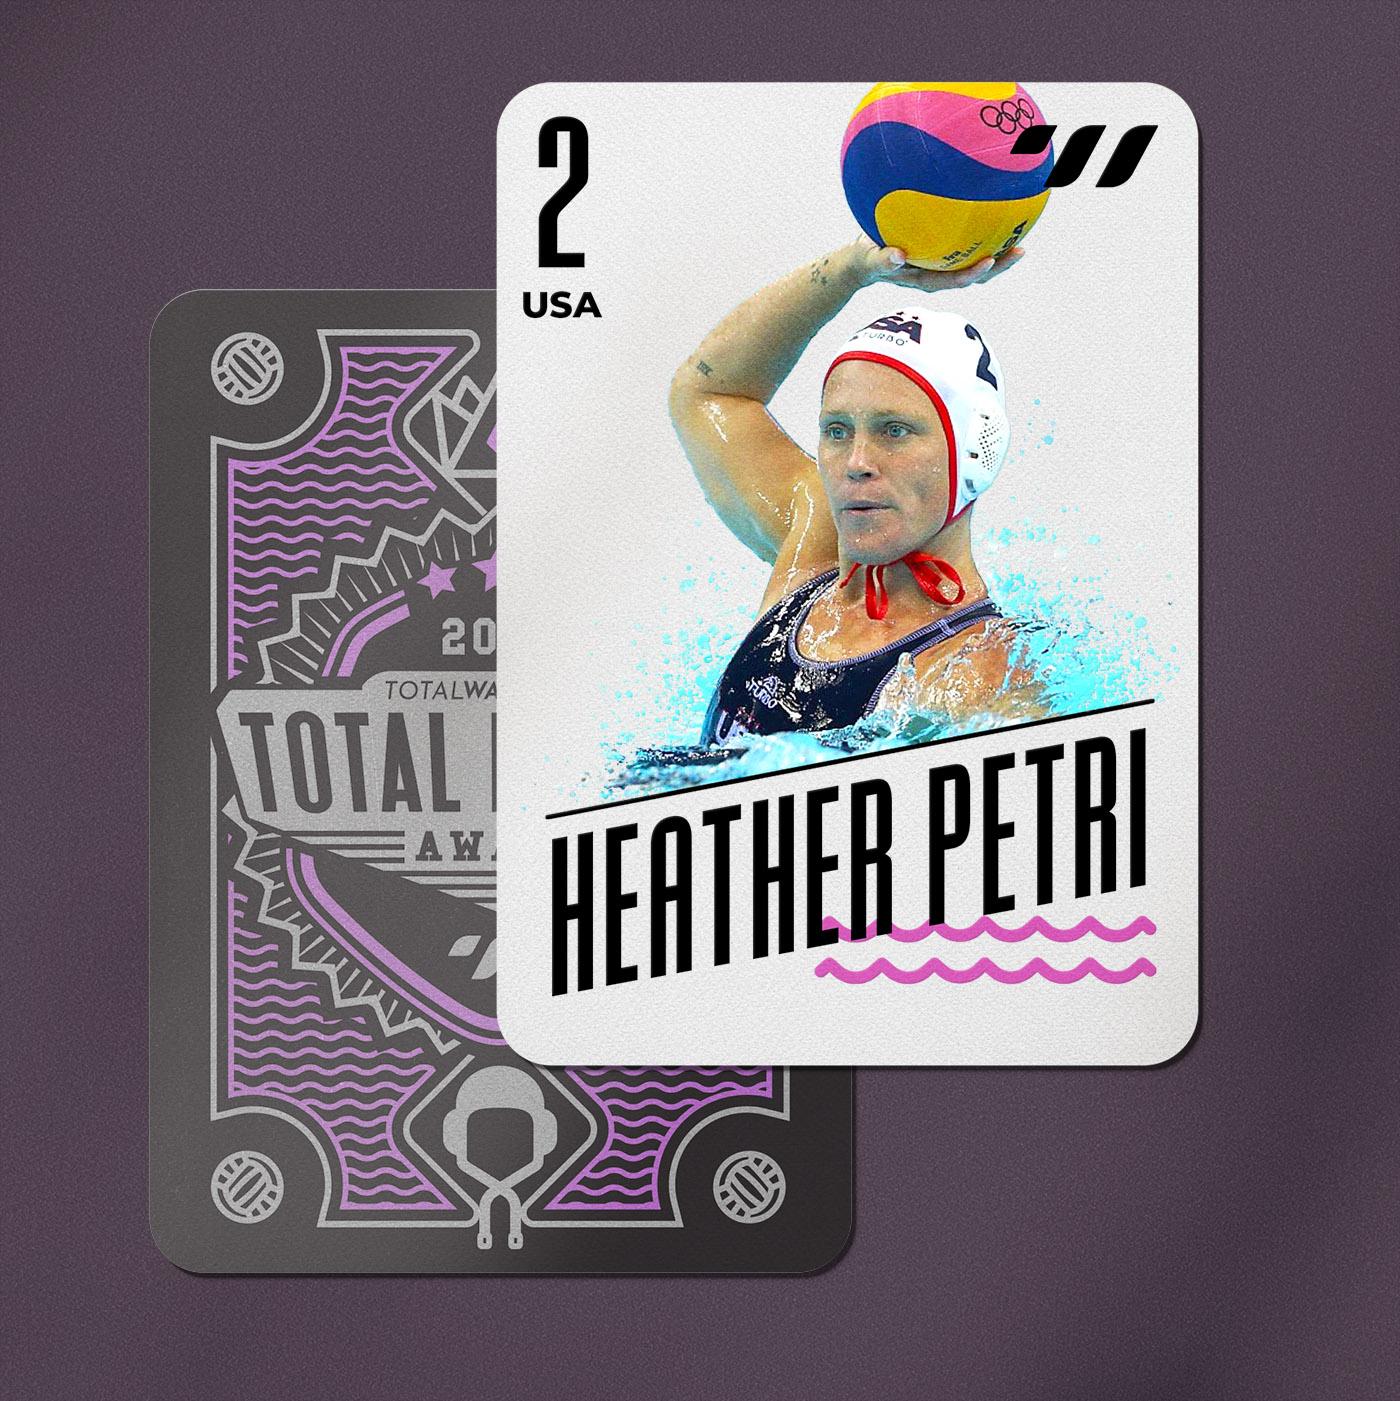 RIGHT SIDE - Heather Petri (USA)